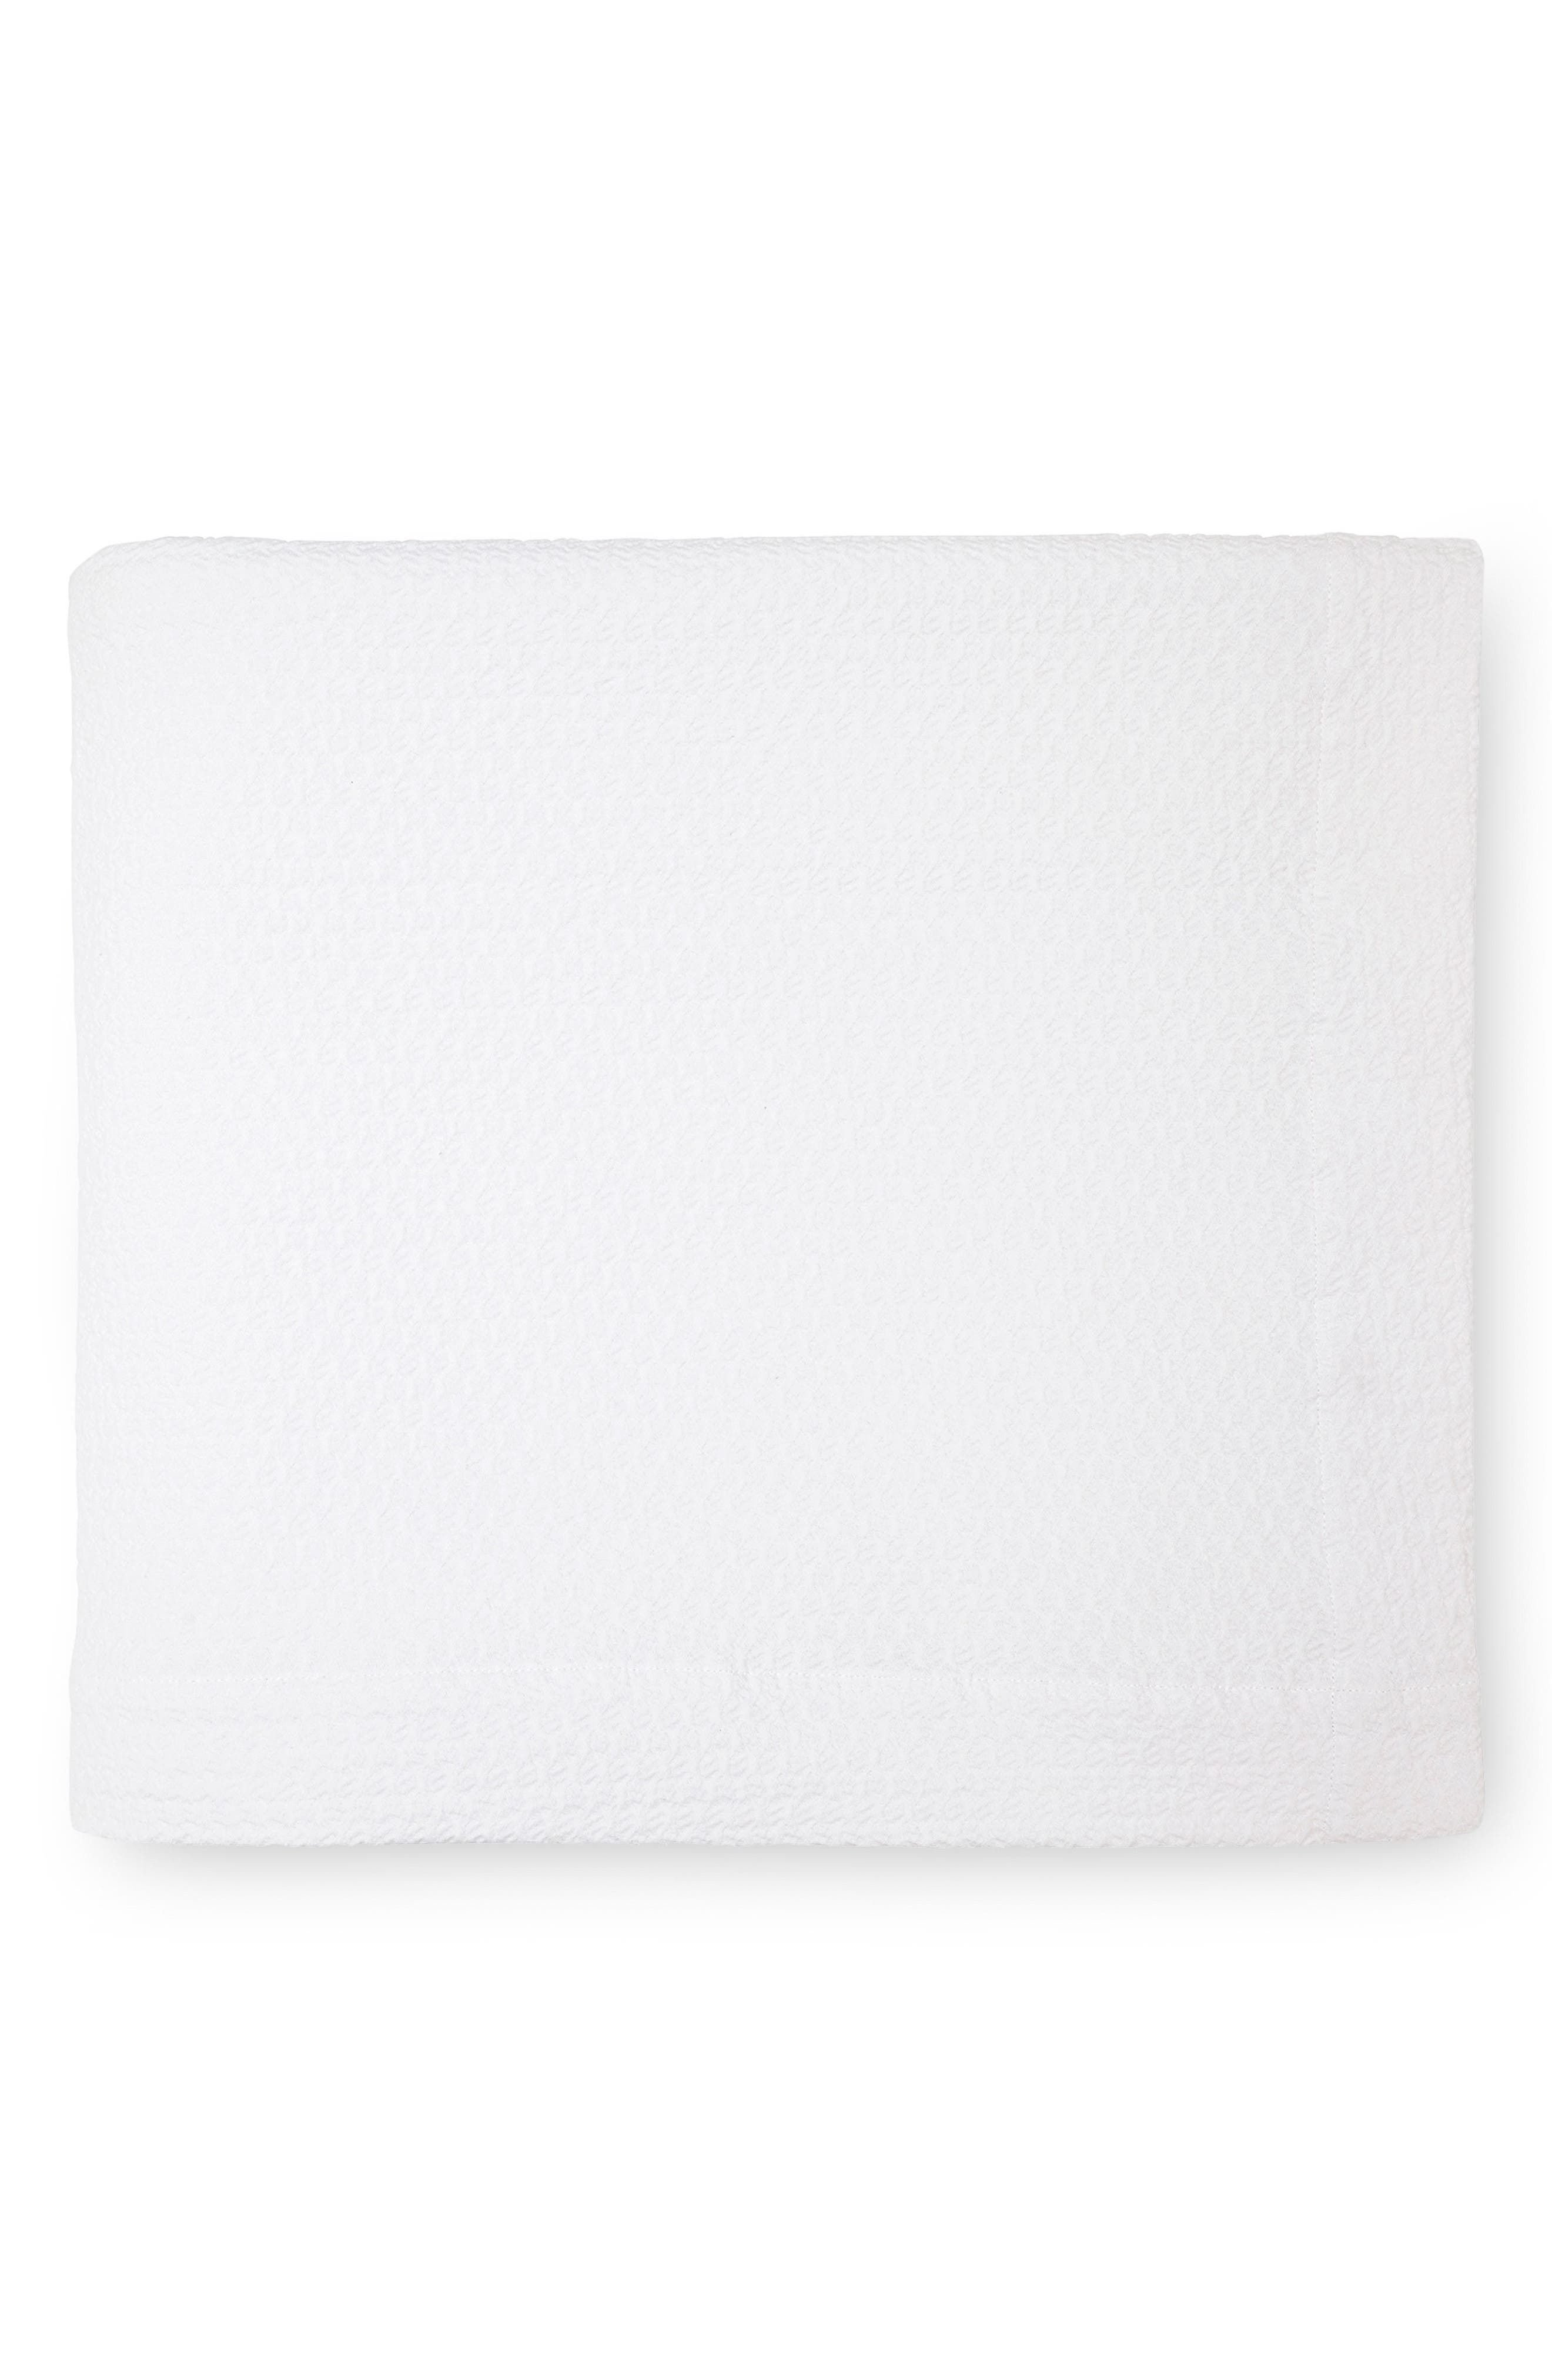 Merisso Blanket,                             Main thumbnail 1, color,                             WHITE